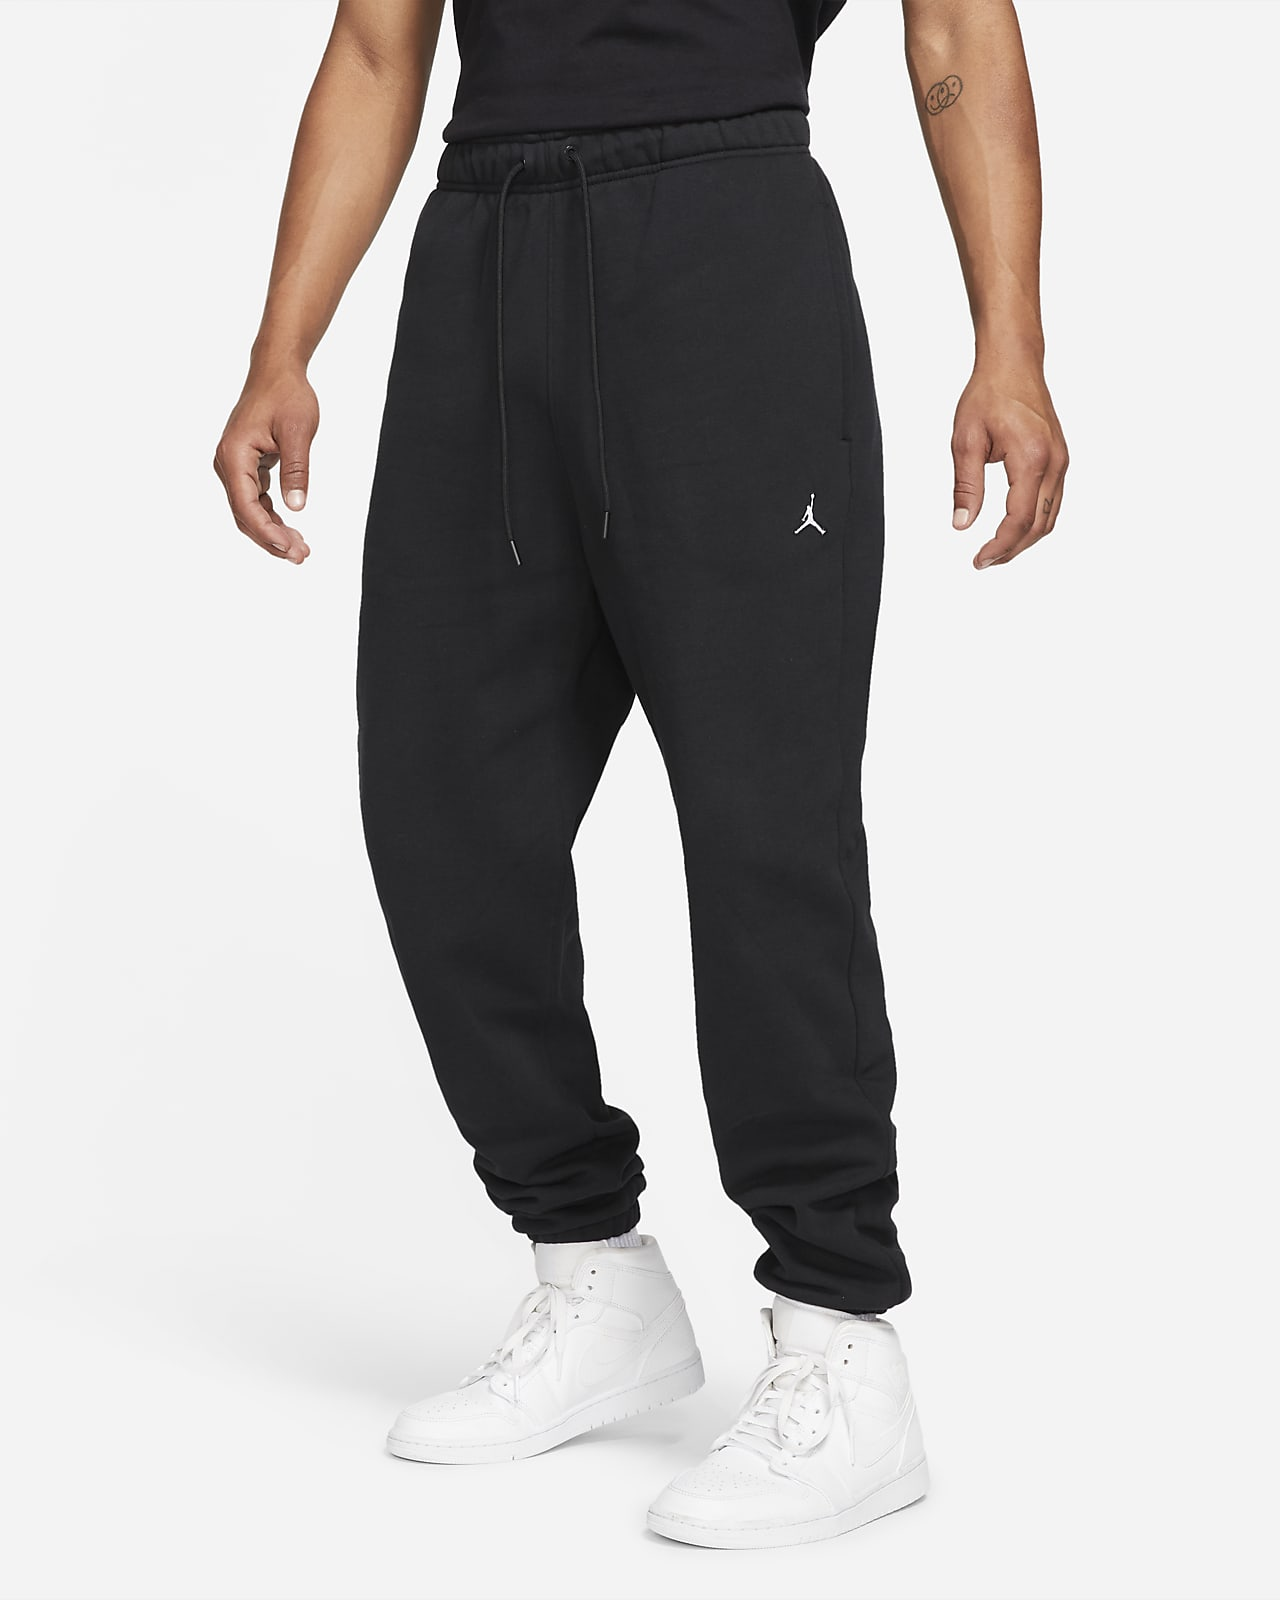 Pantaloni in fleece Jordan Essentials - Uomo